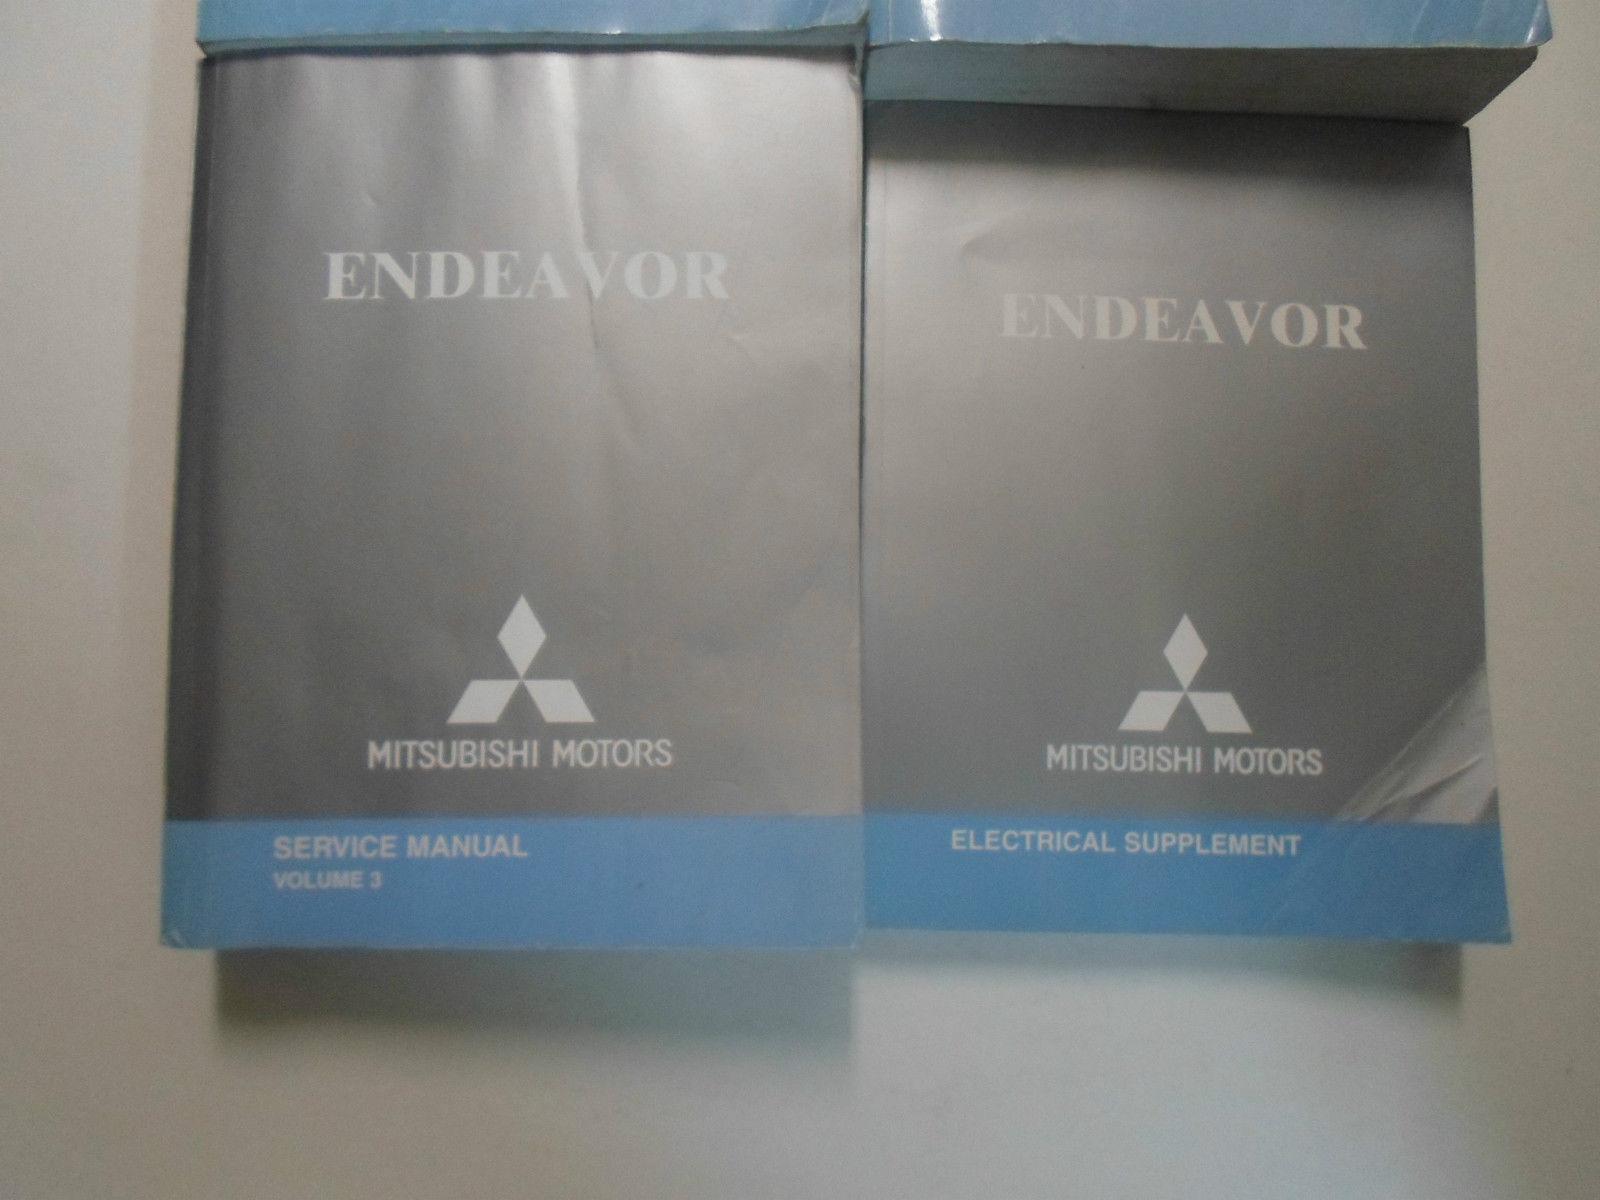 2005 MITSUBISHI ENDEAVOR Service Shop Repair Manual 4 VOLUME SET WORN FACTORY